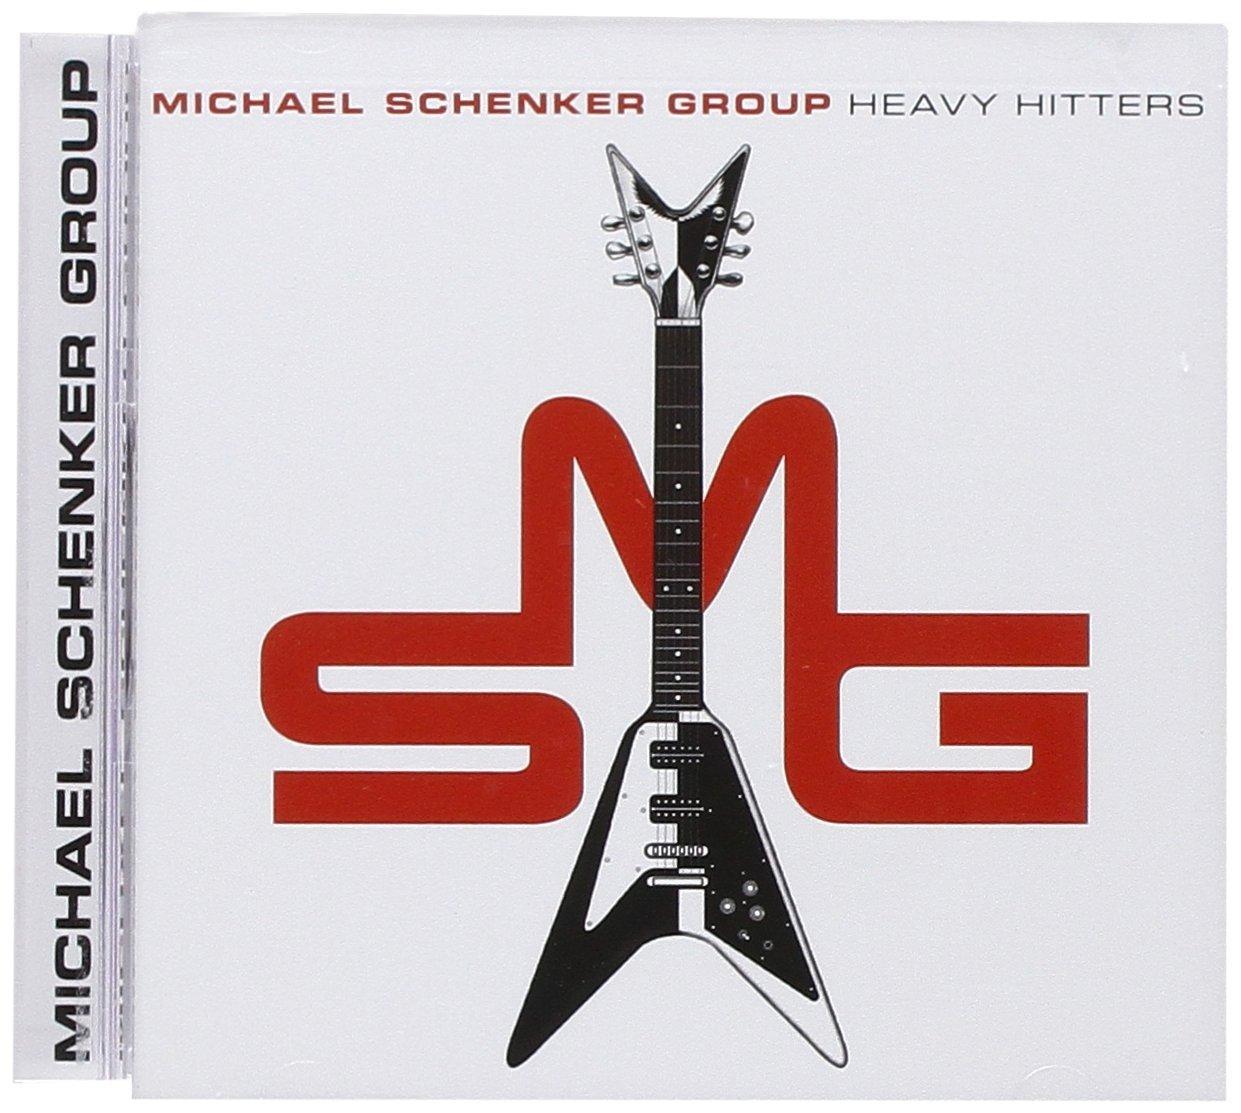 Michael Schenker - Heavy Hitters - Amazon.com Music